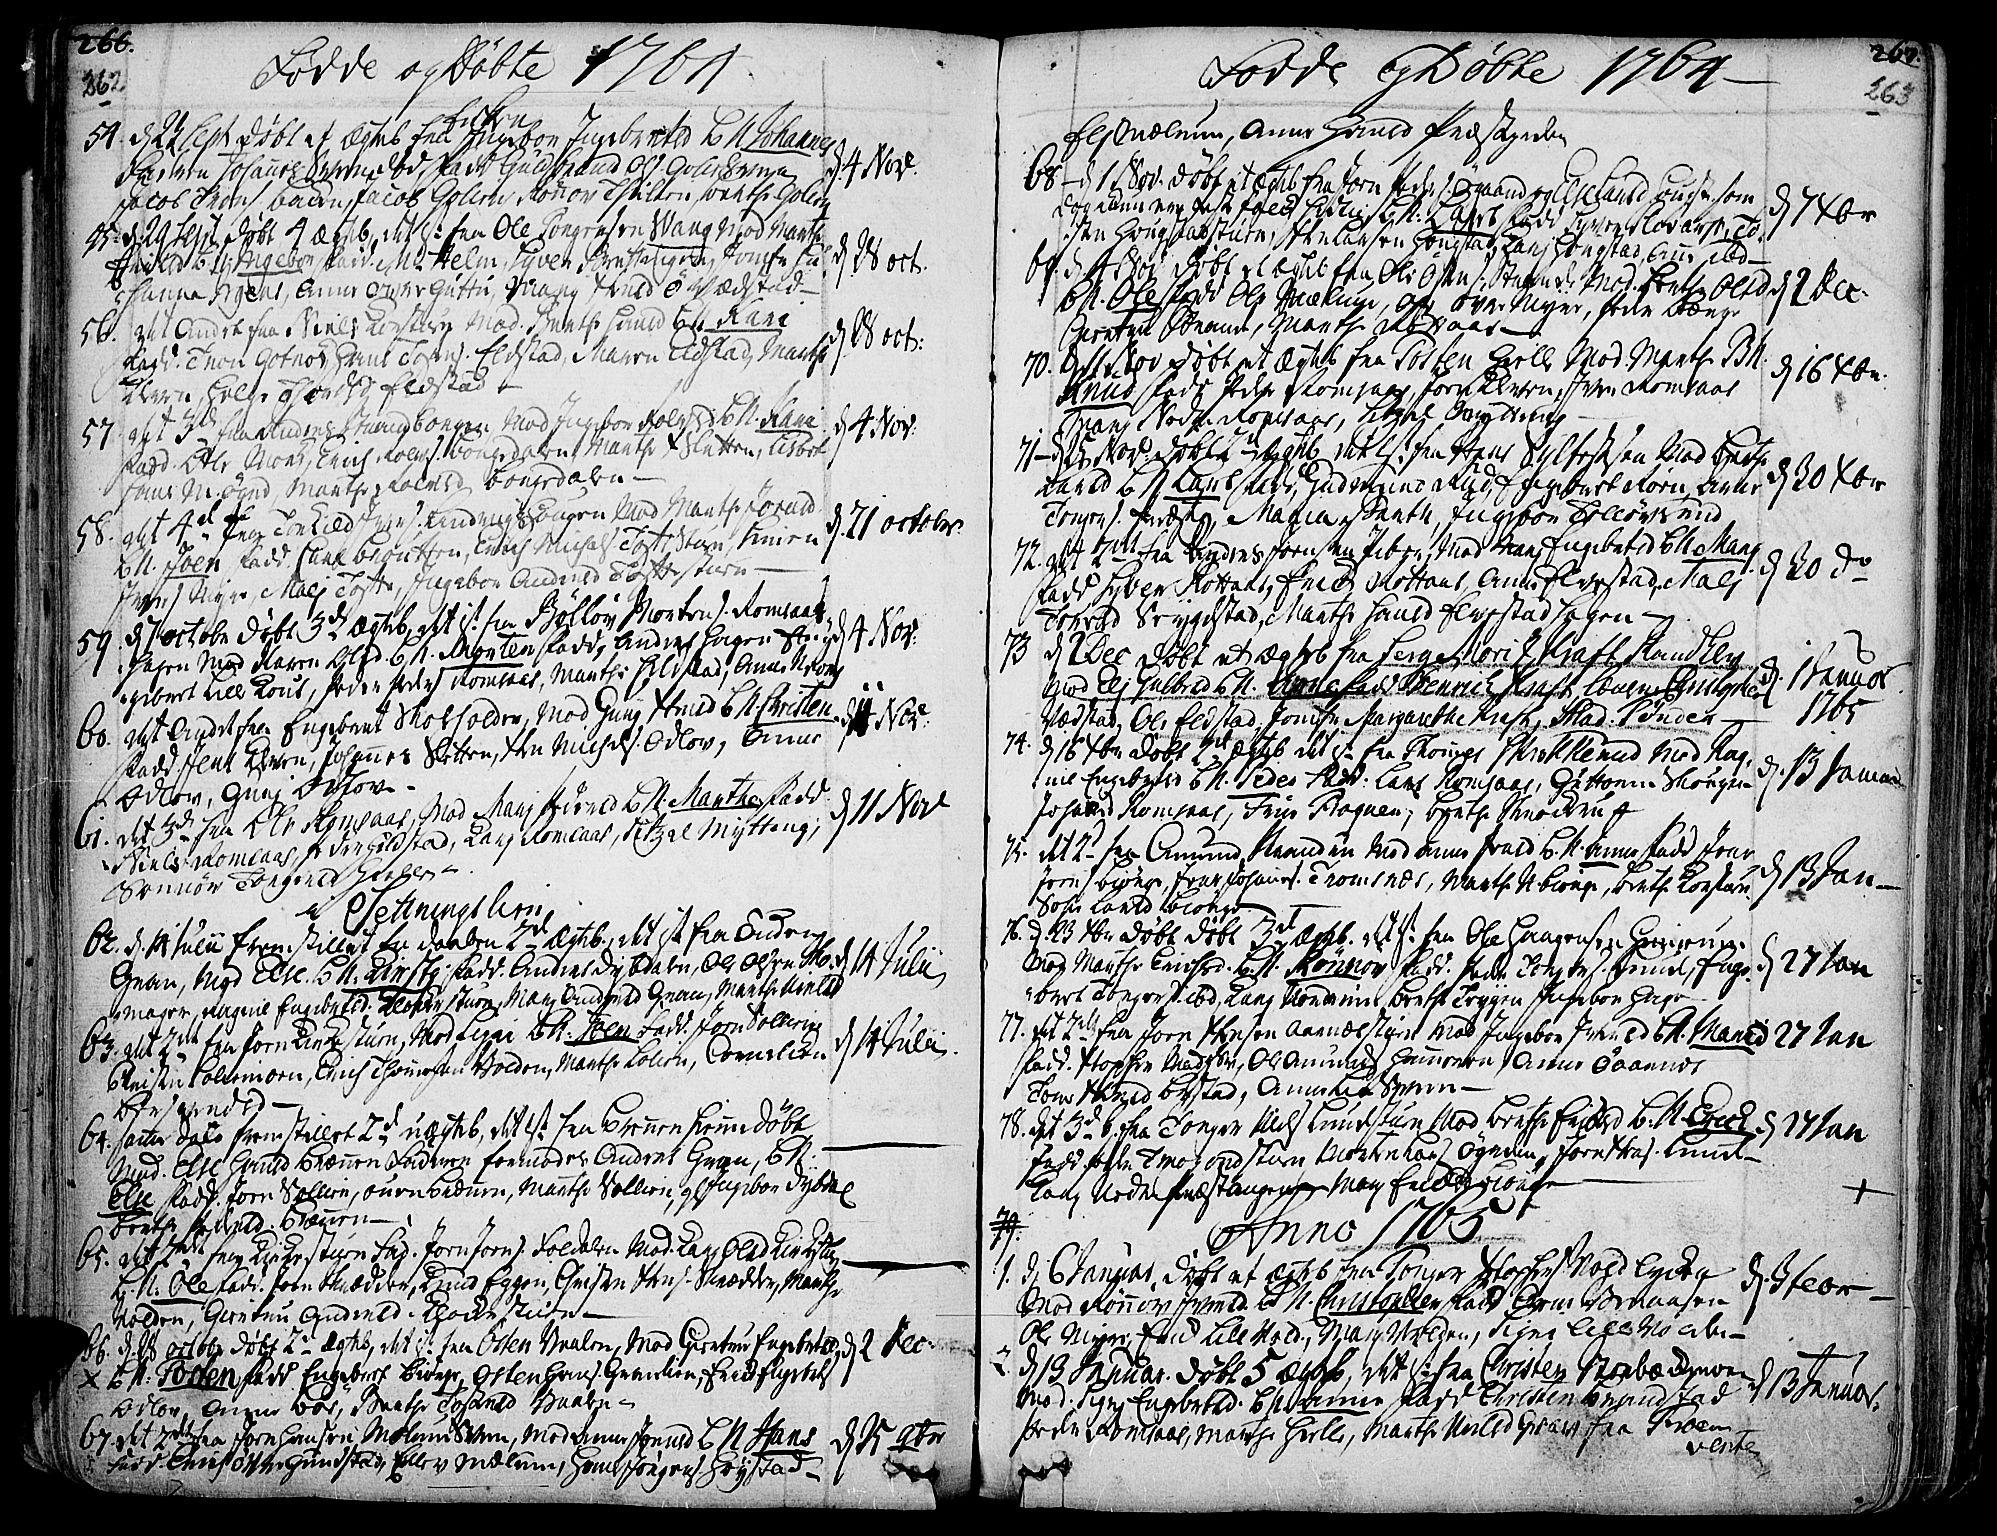 SAH, Ringebu prestekontor, Ministerialbok nr. 2, 1734-1780, s. 262-263